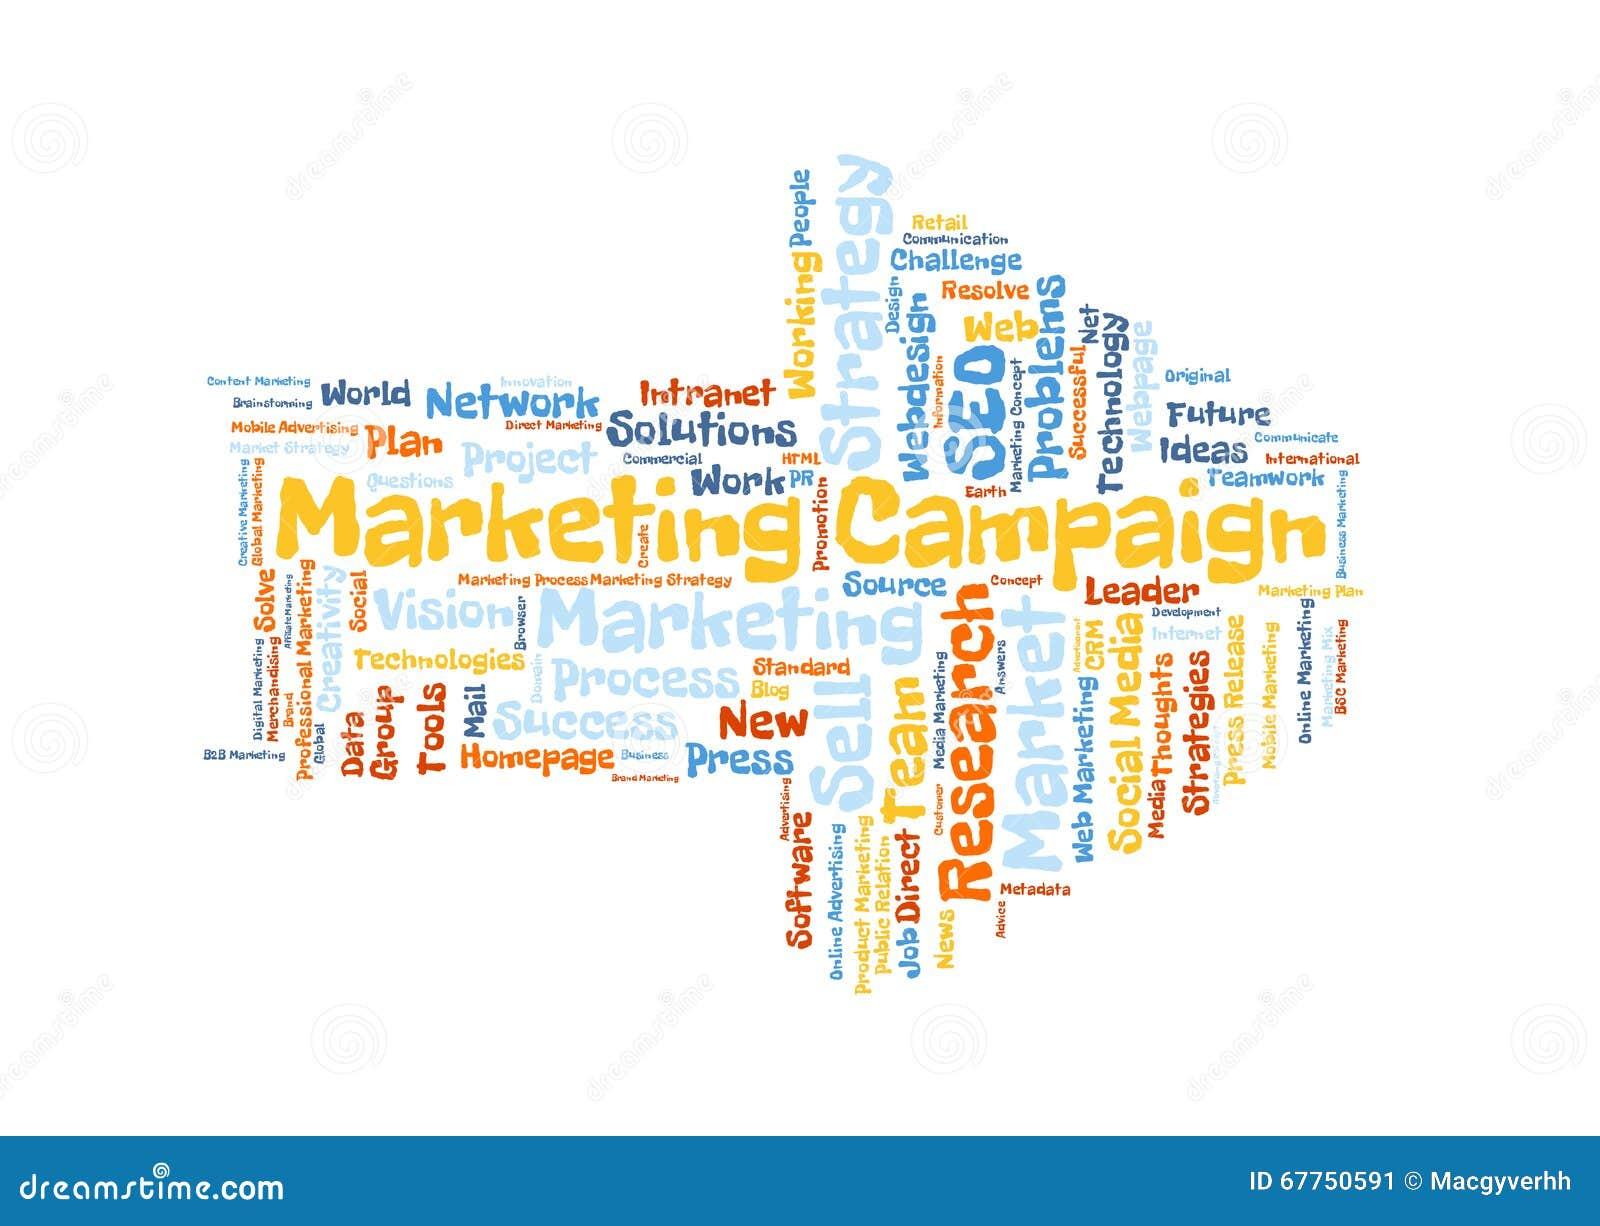 Marketing Campaign Word Cloud Stock Illustration - Illustration of ...